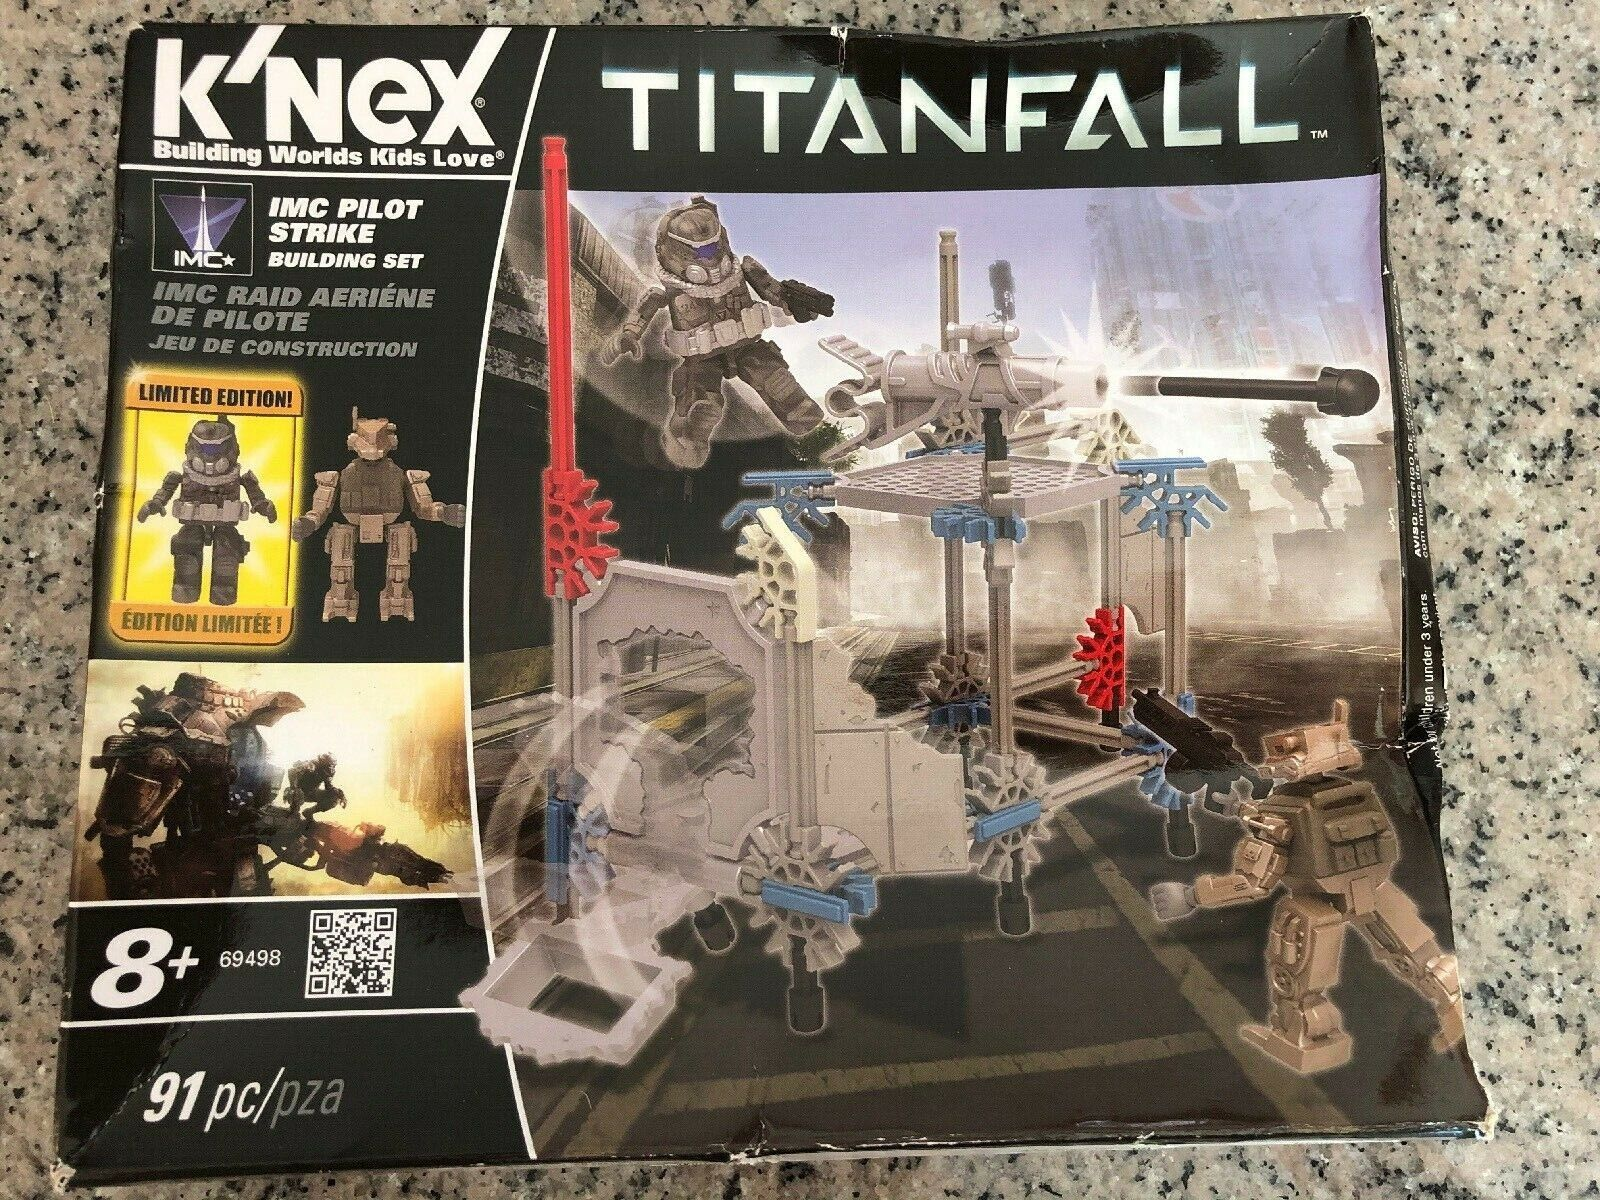 K/'NEX TITANFALL 86pcs IMC Pilot Strike Building set KNEX